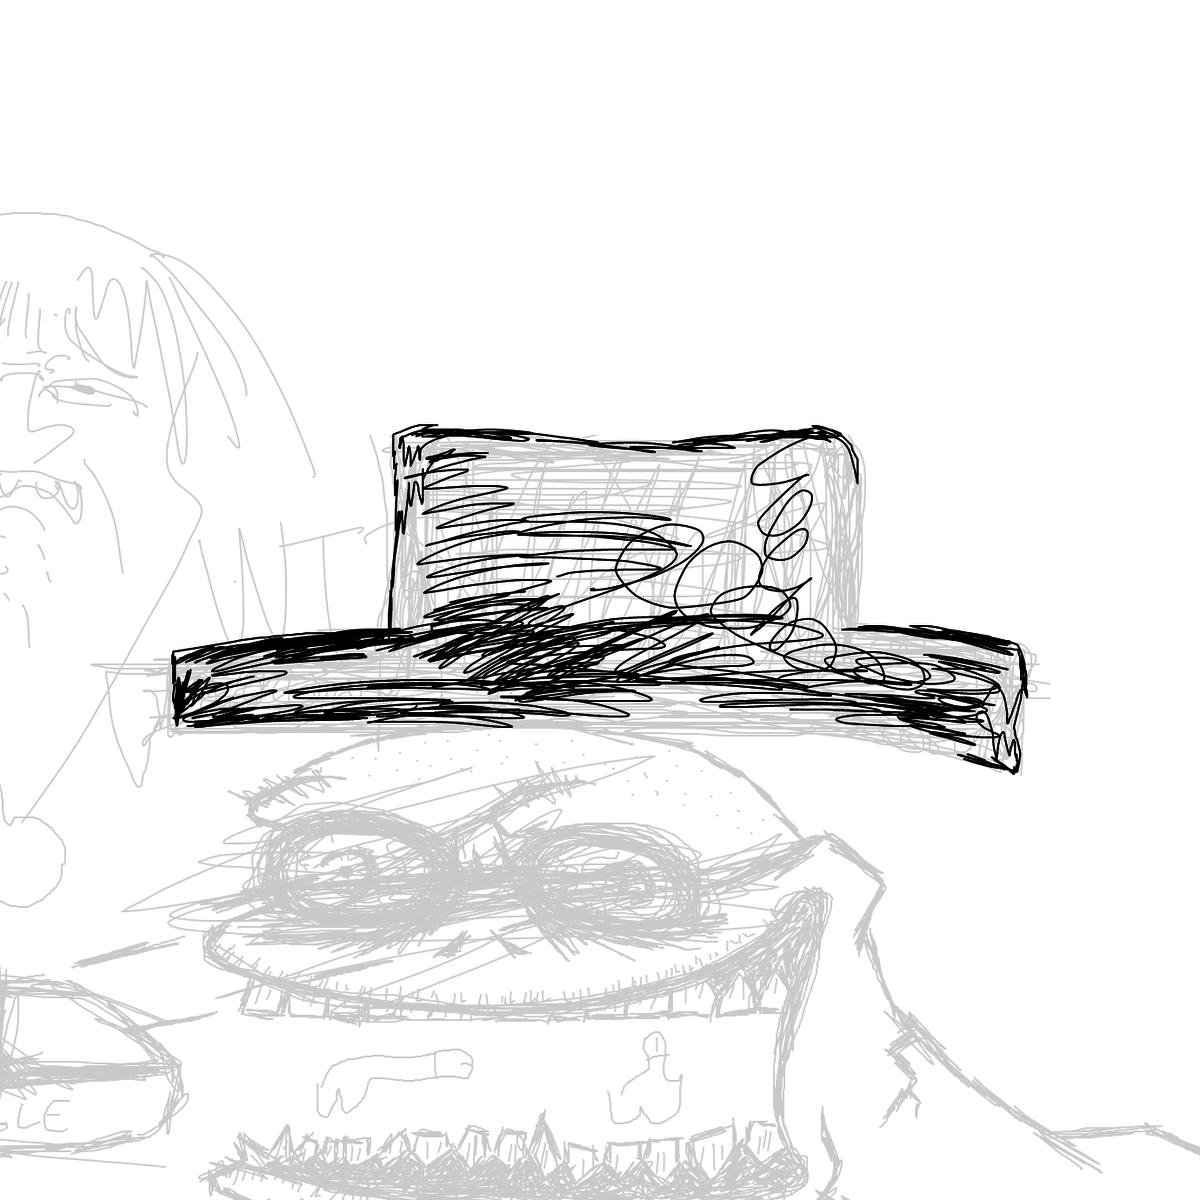 BAAAM drawing#9731 lat:51.5004348754882800lng: -0.1237438768148422